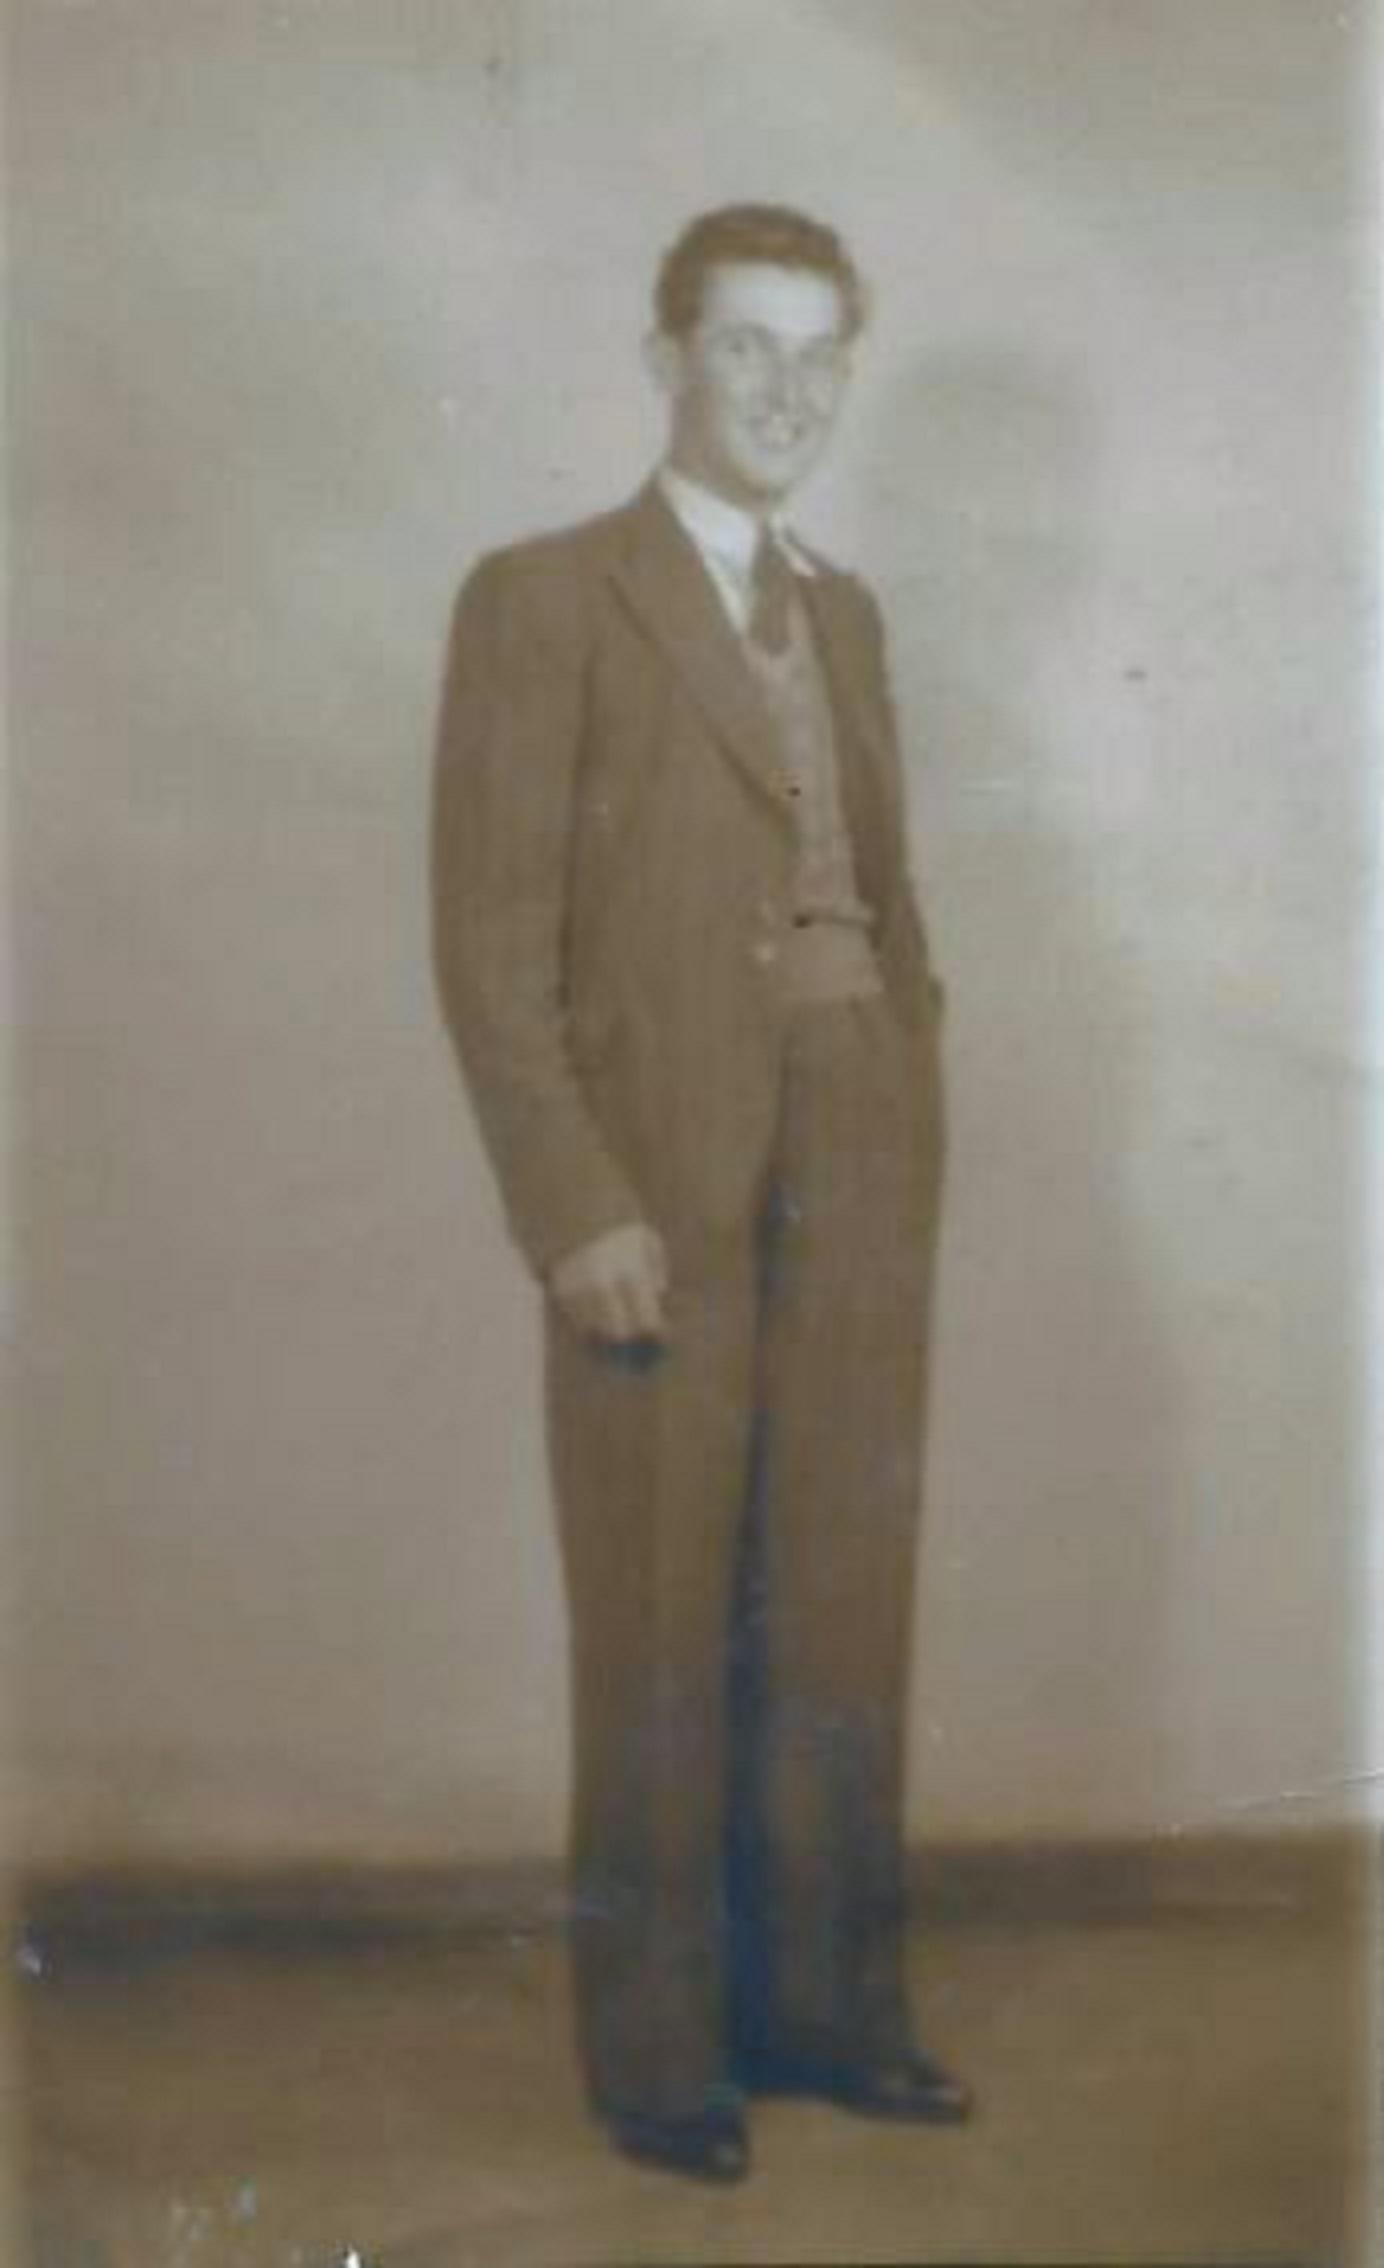 Martin Keaveny, Esker. 1940